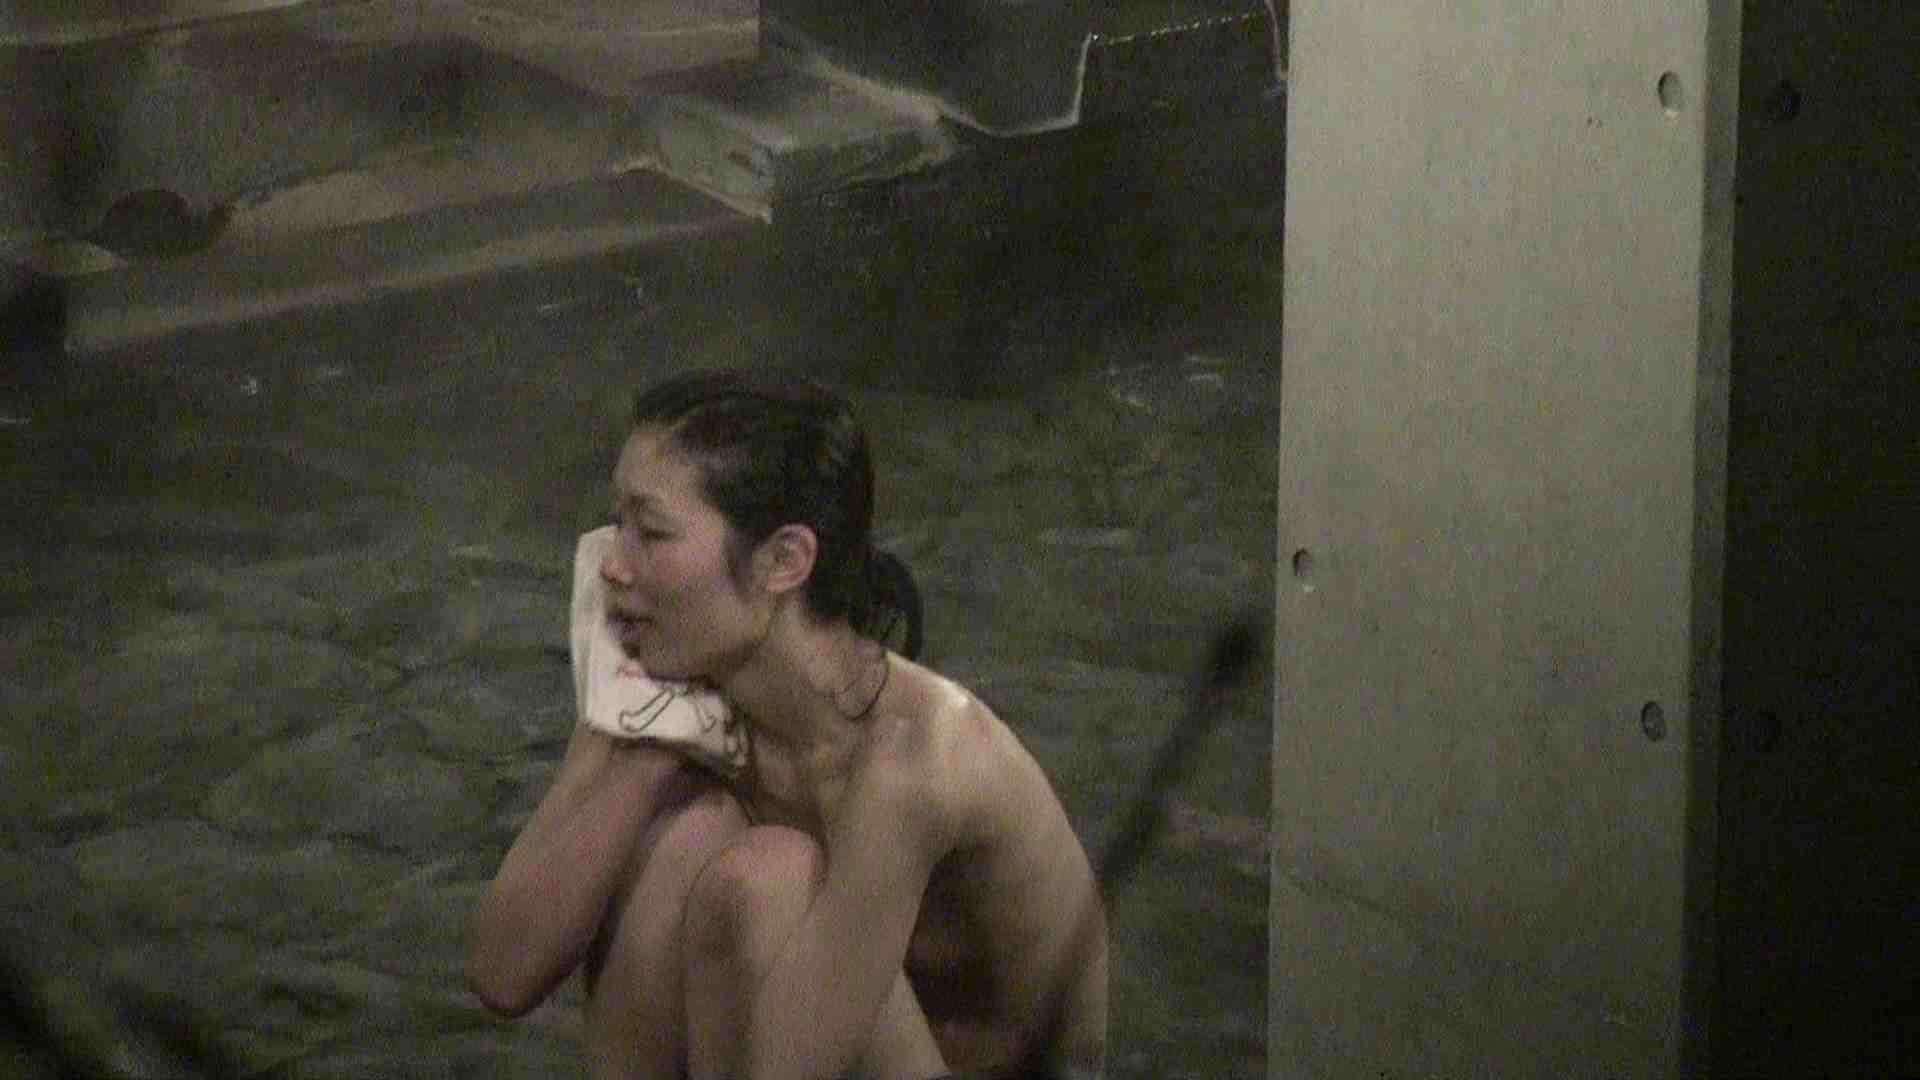 Aquaな露天風呂Vol.399 0   0  81連発 79